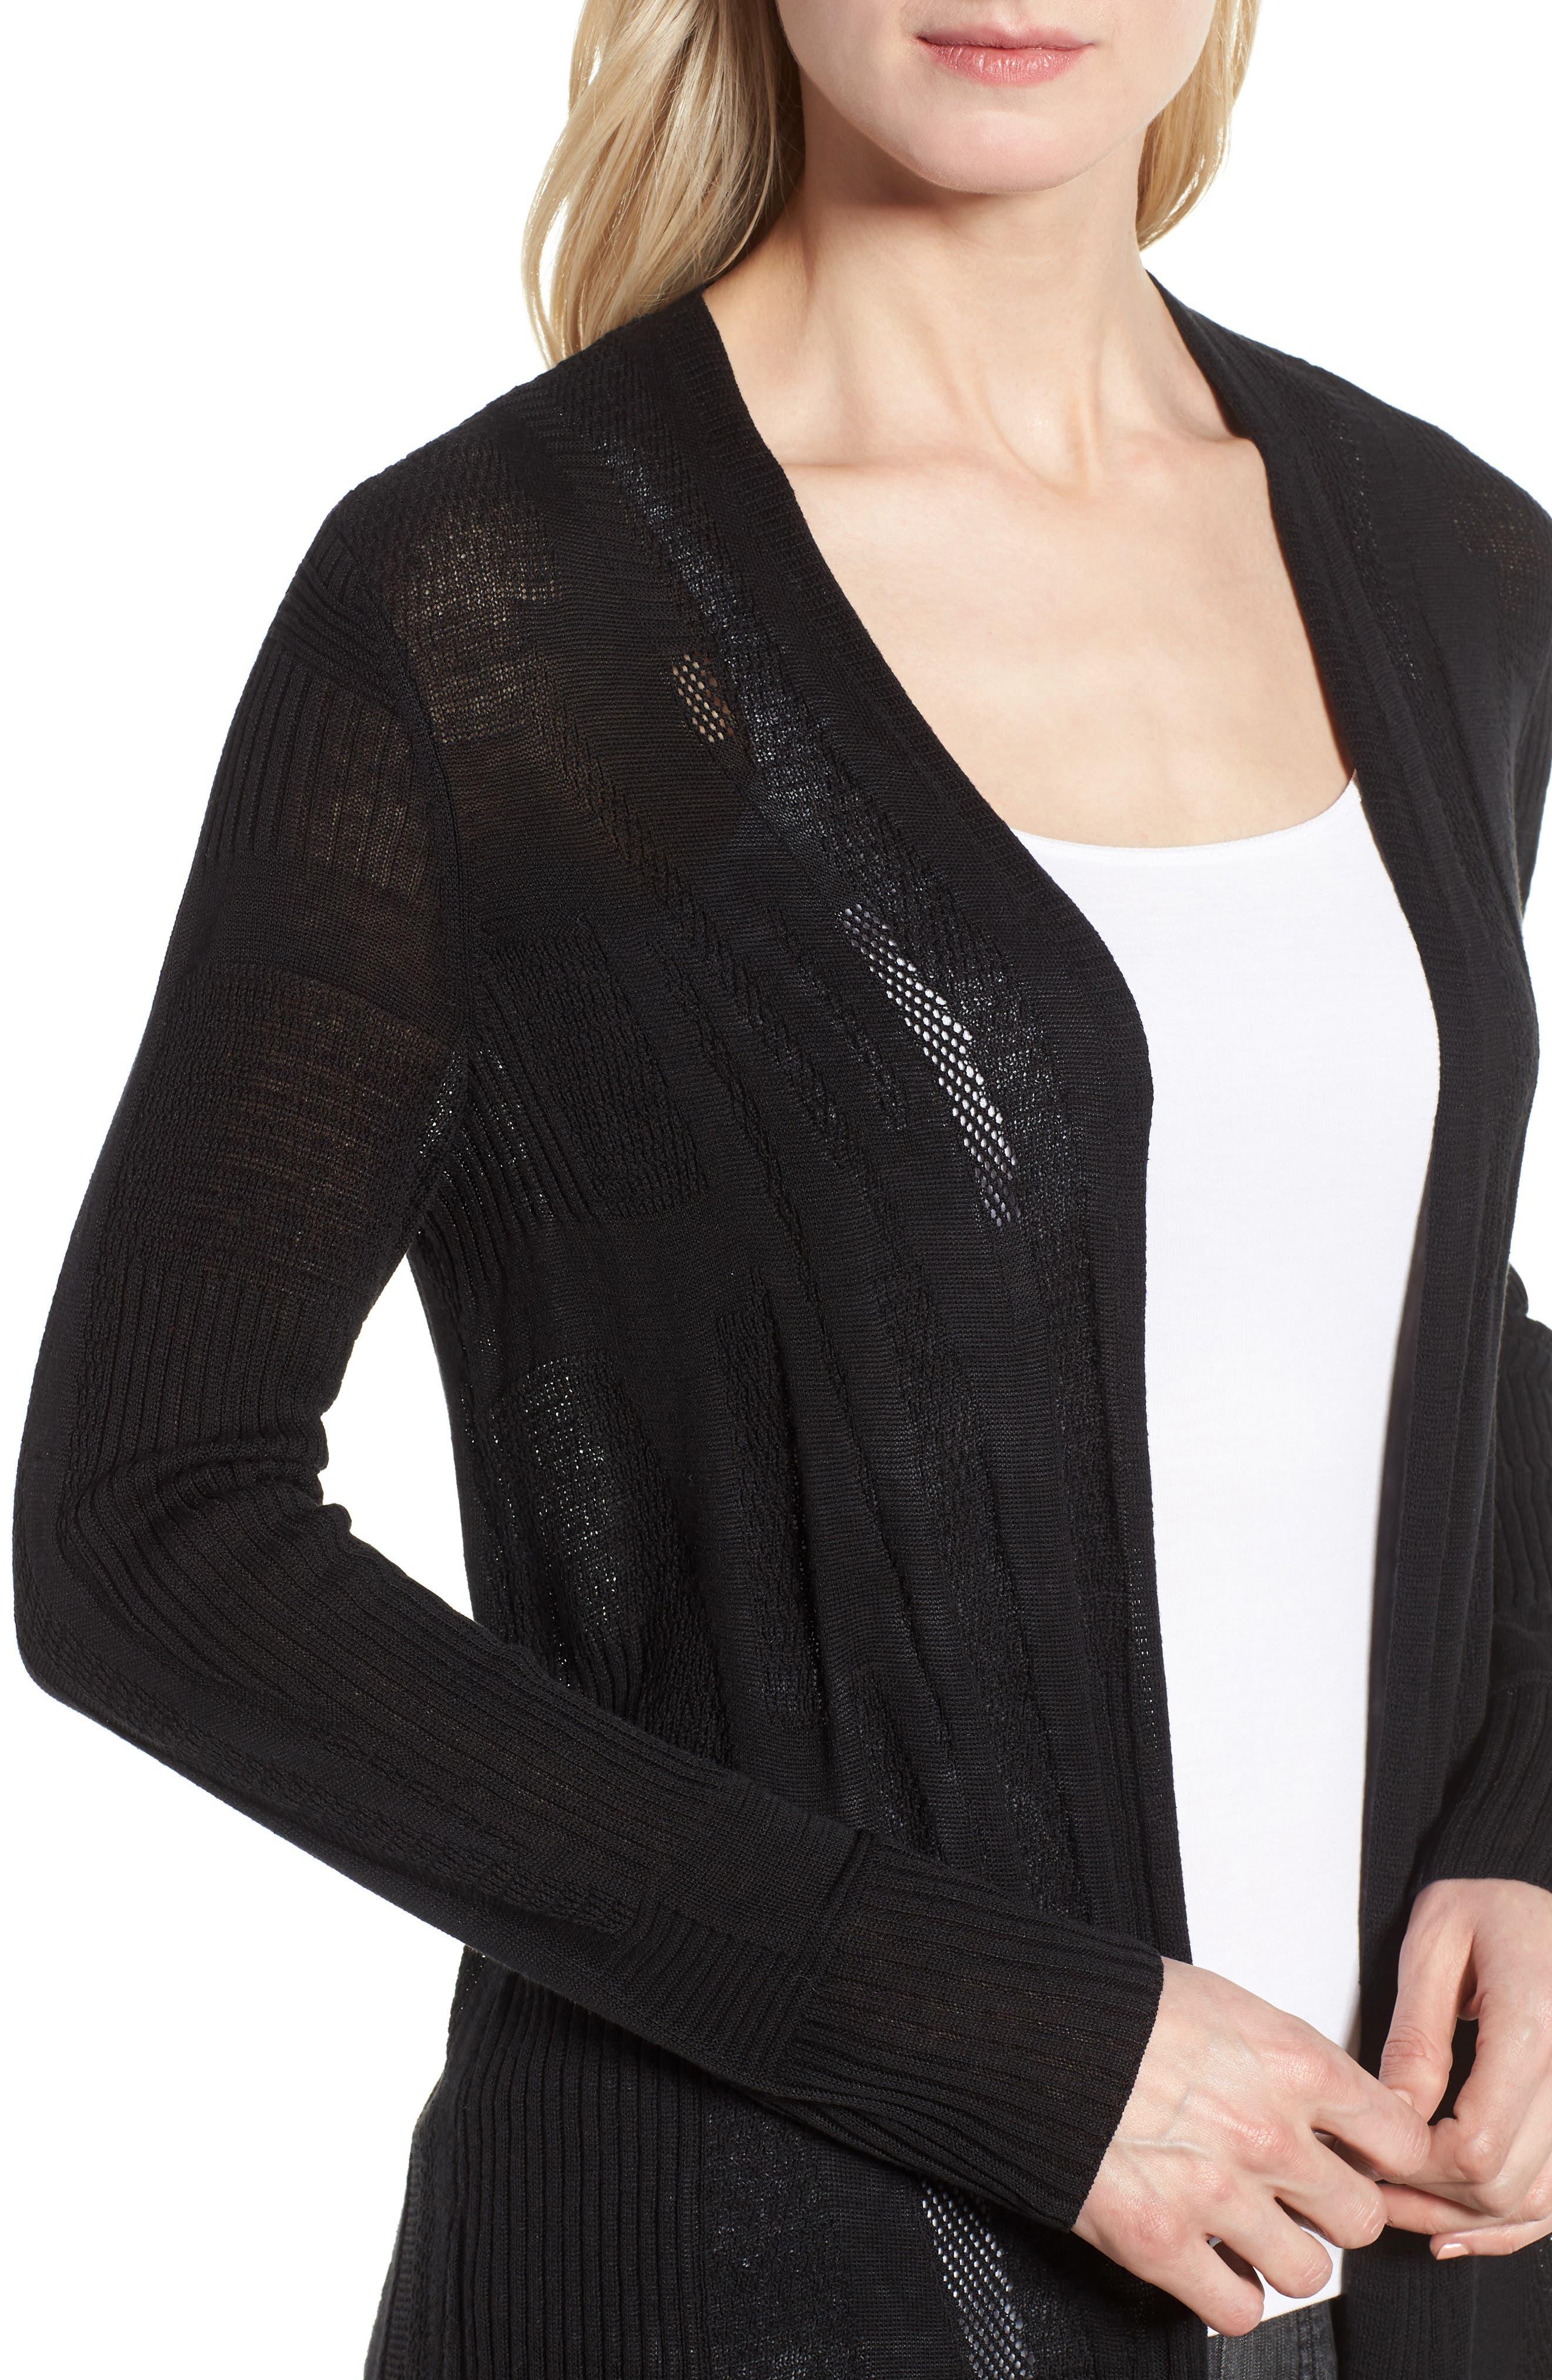 Simple Silk & Organic Linen Cardigan,                             Alternate thumbnail 4, color,                             Black